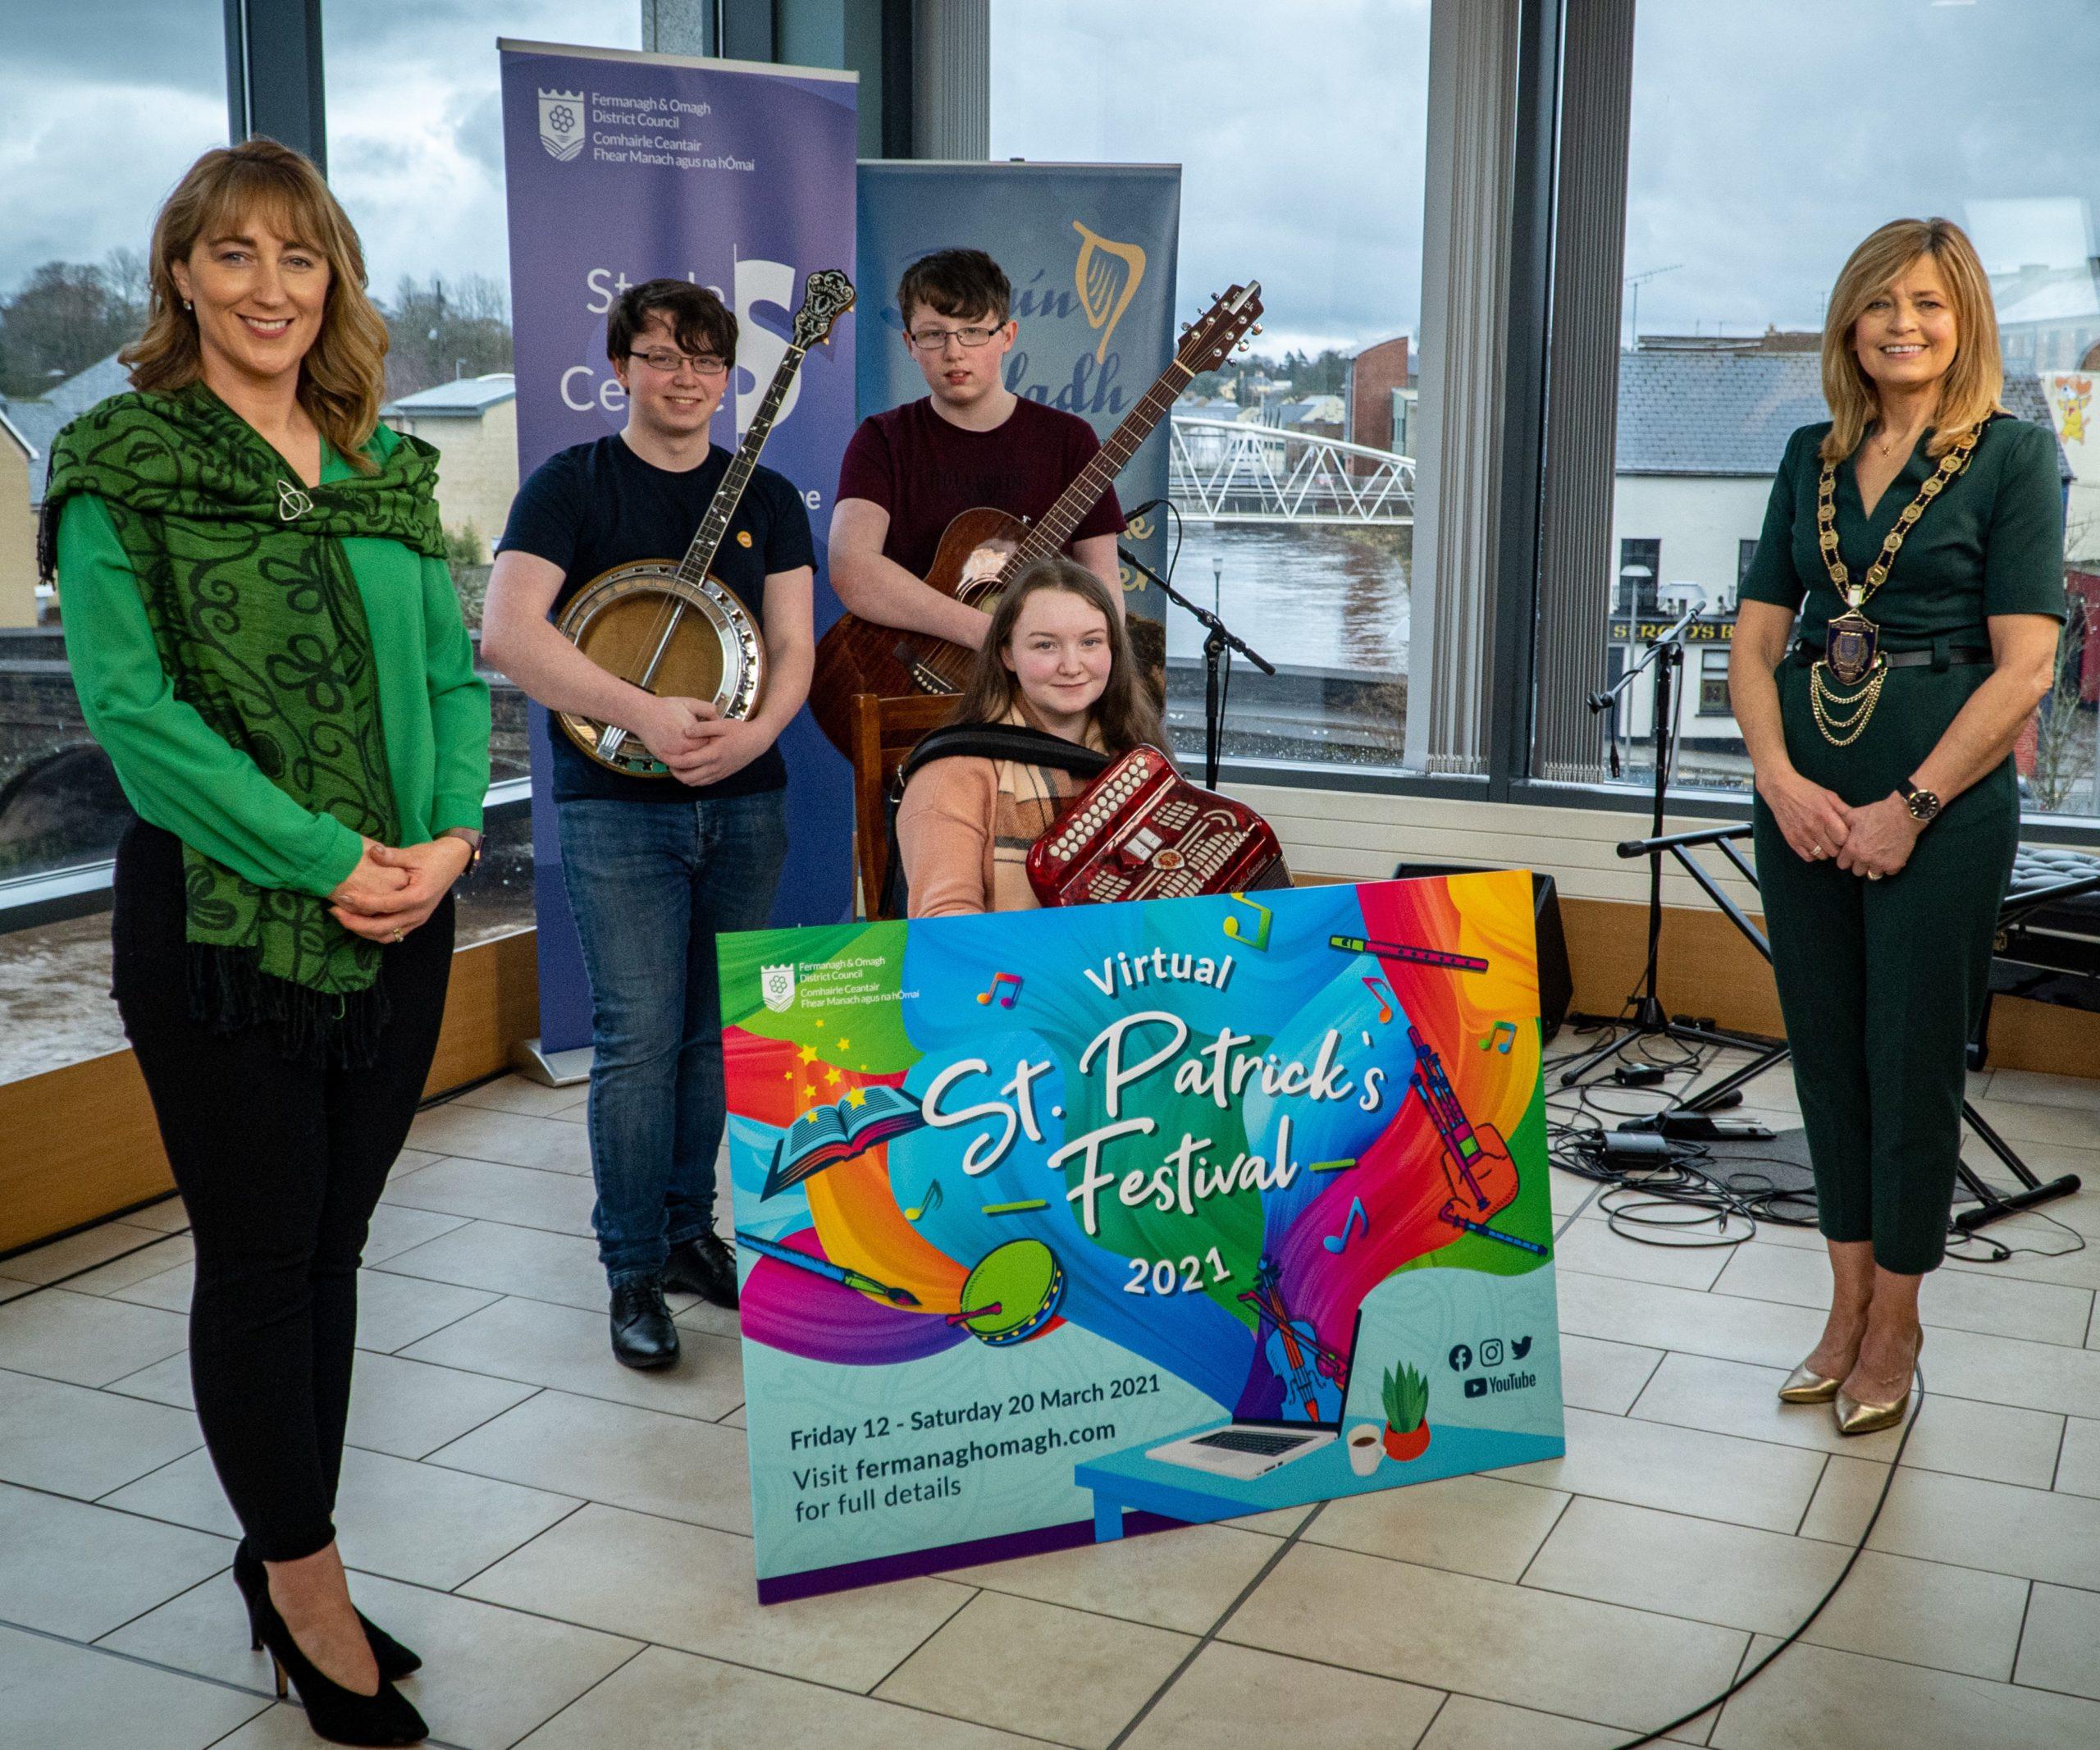 St Patricks festival launch